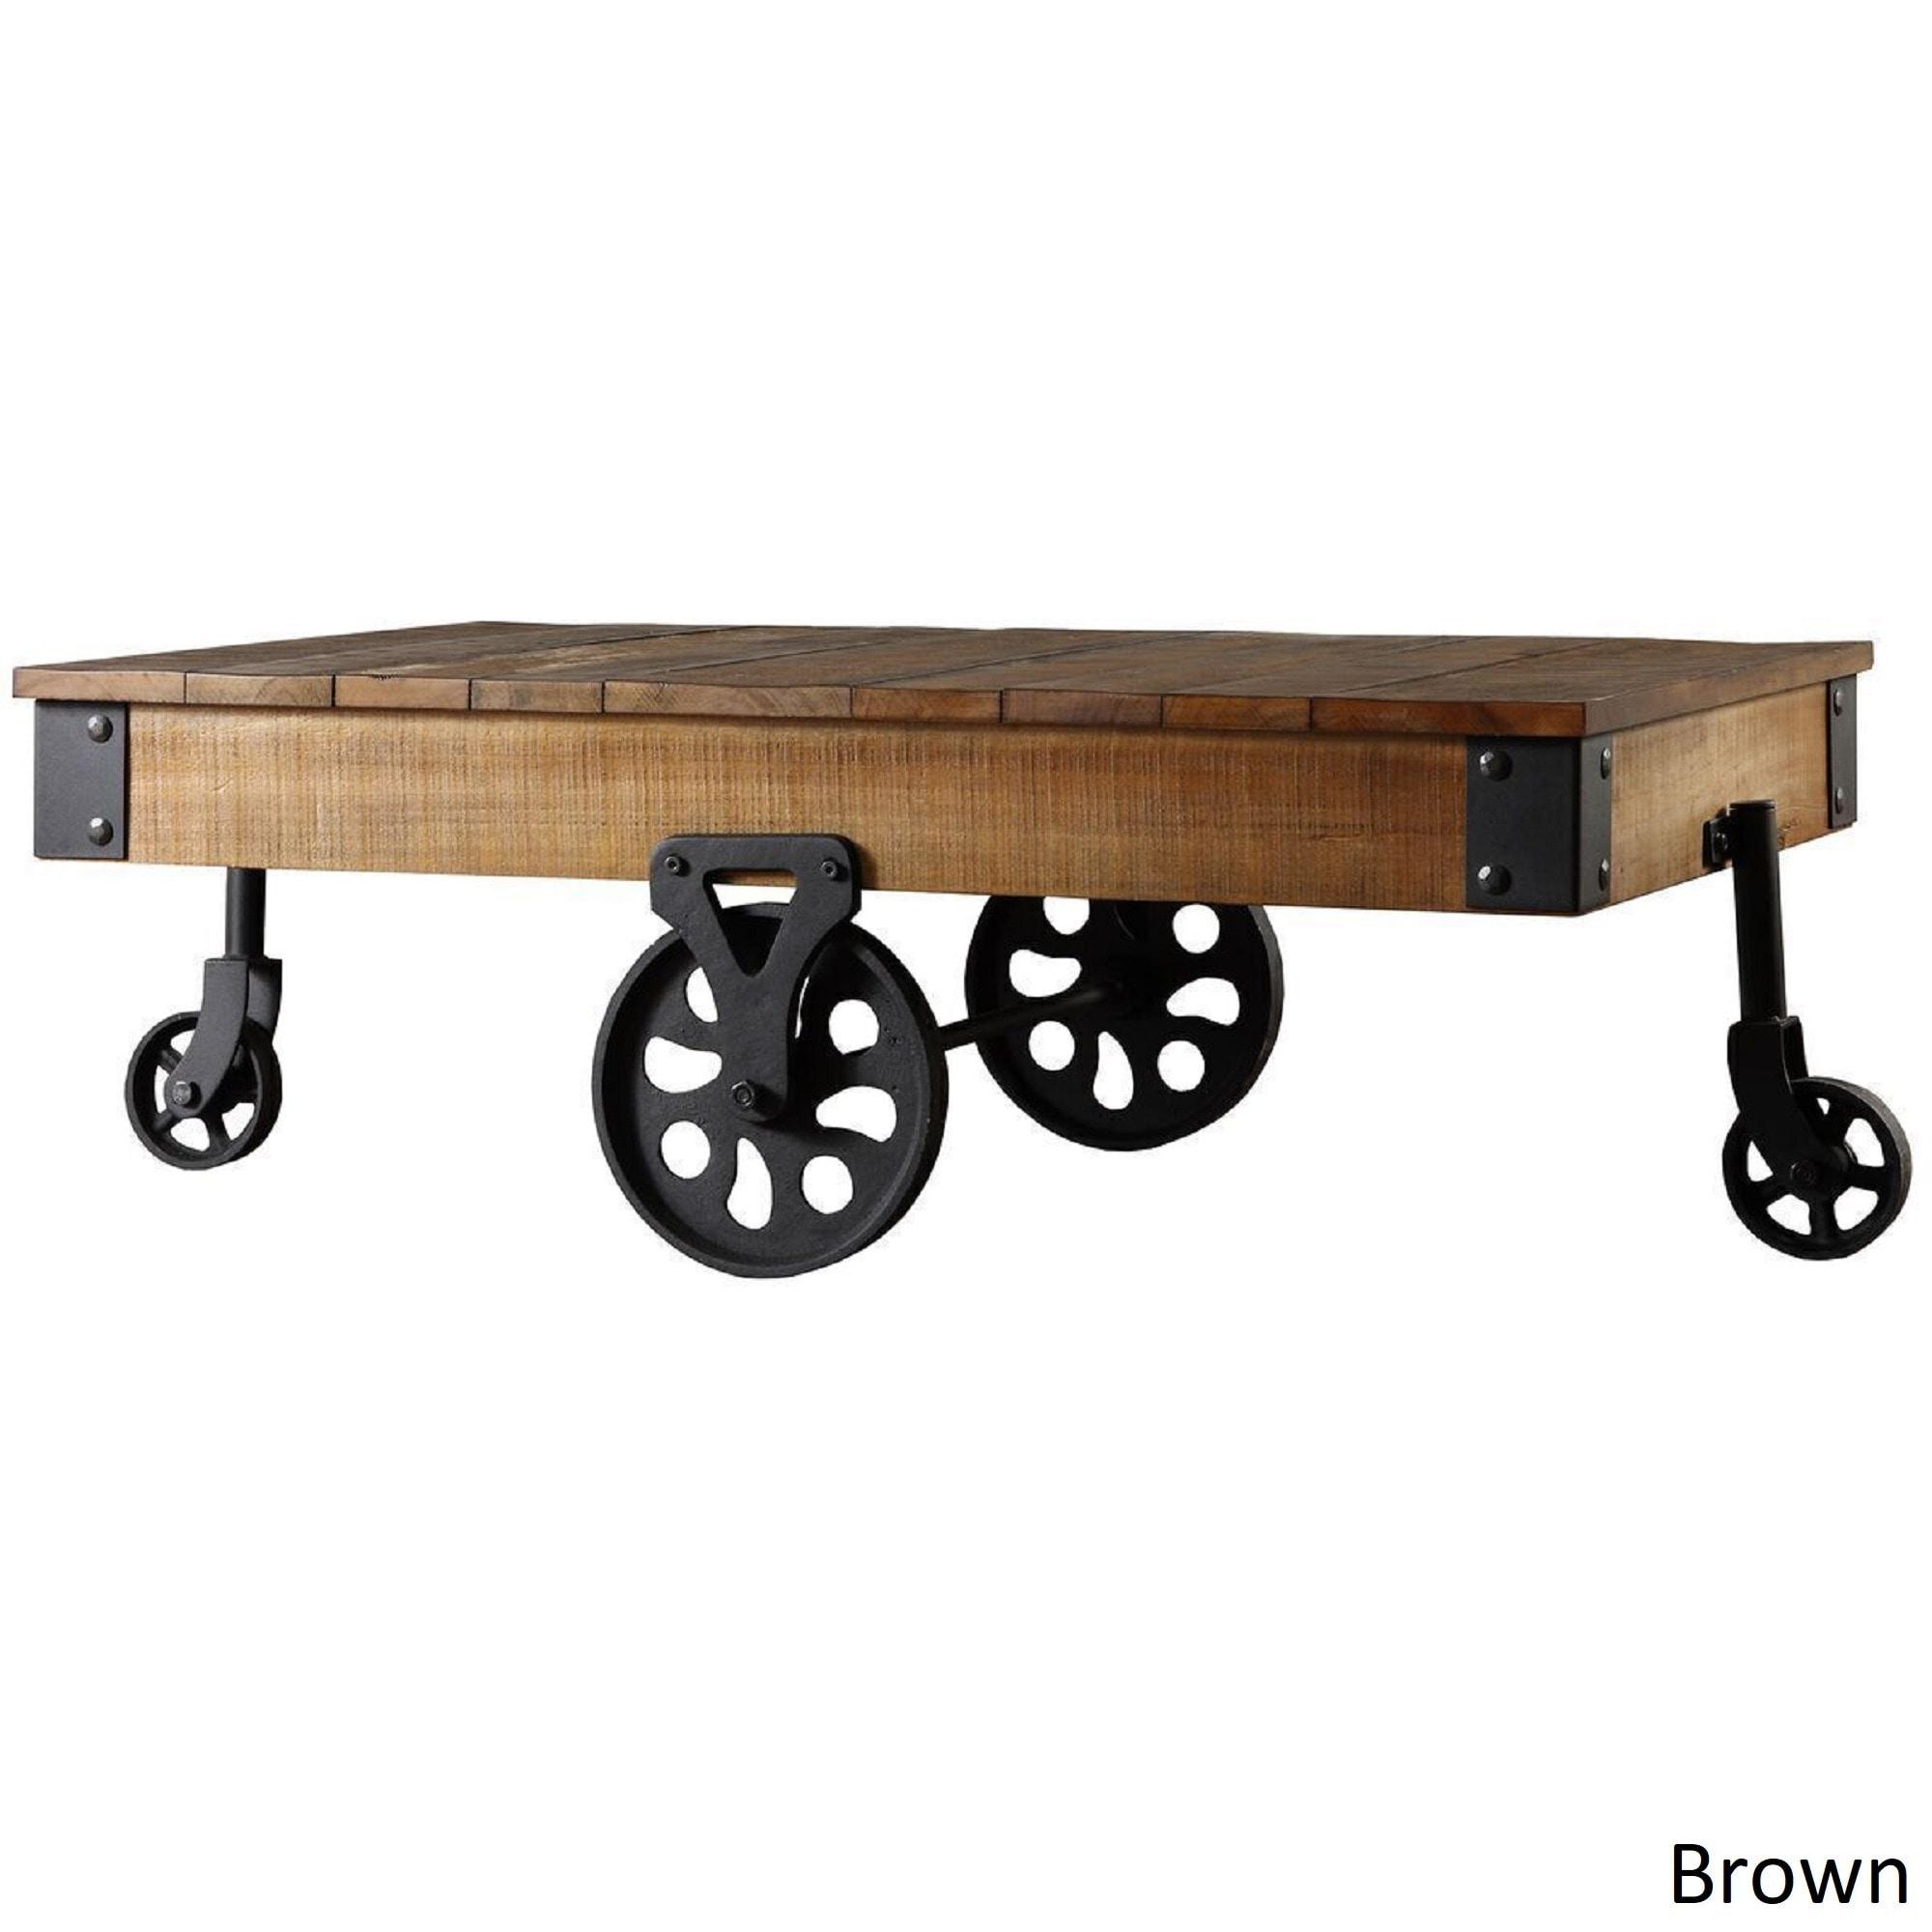 Shop Myra Vintage Industrial Modern Rustic 47 Inch Coffee Table By